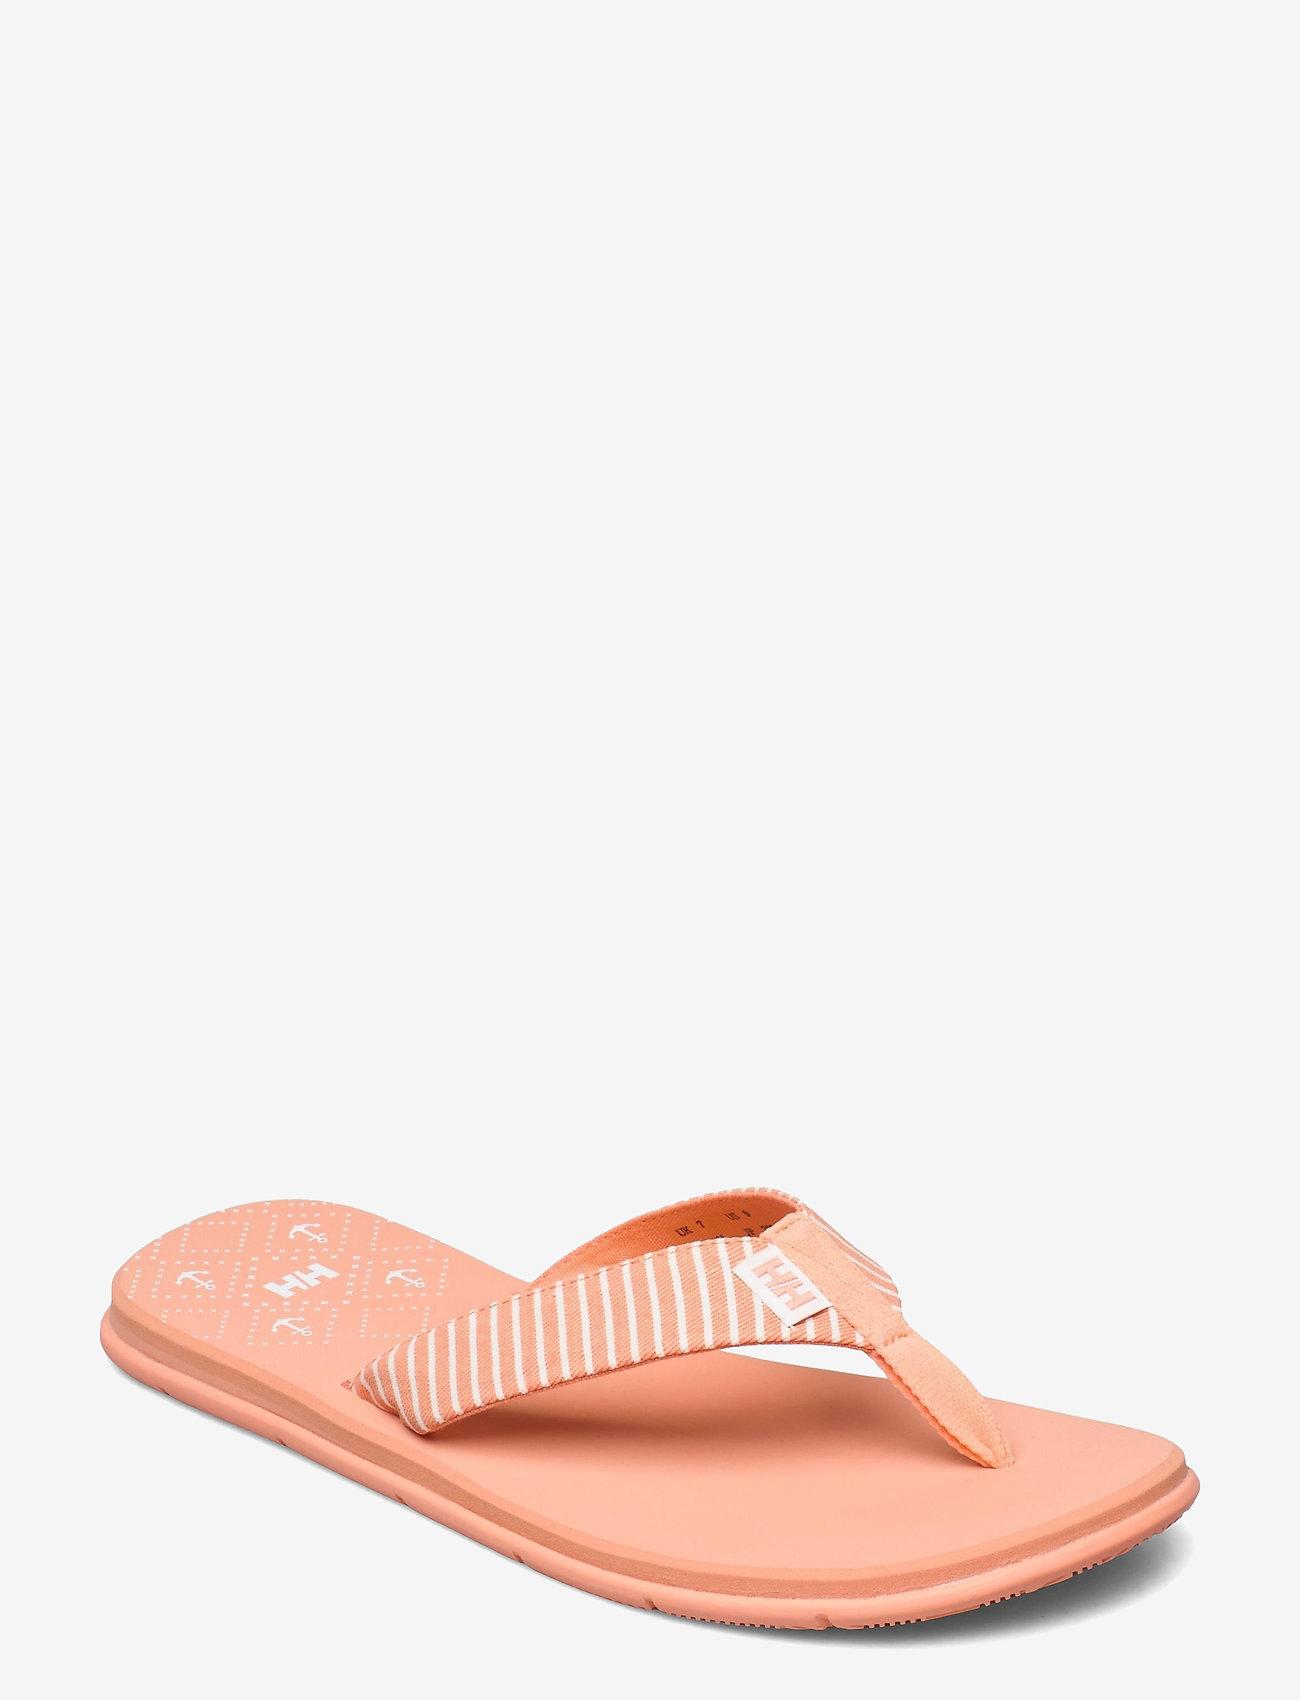 Helly Hansen - W IRIS SANDAL - sport schoenen - melon / off white - 0